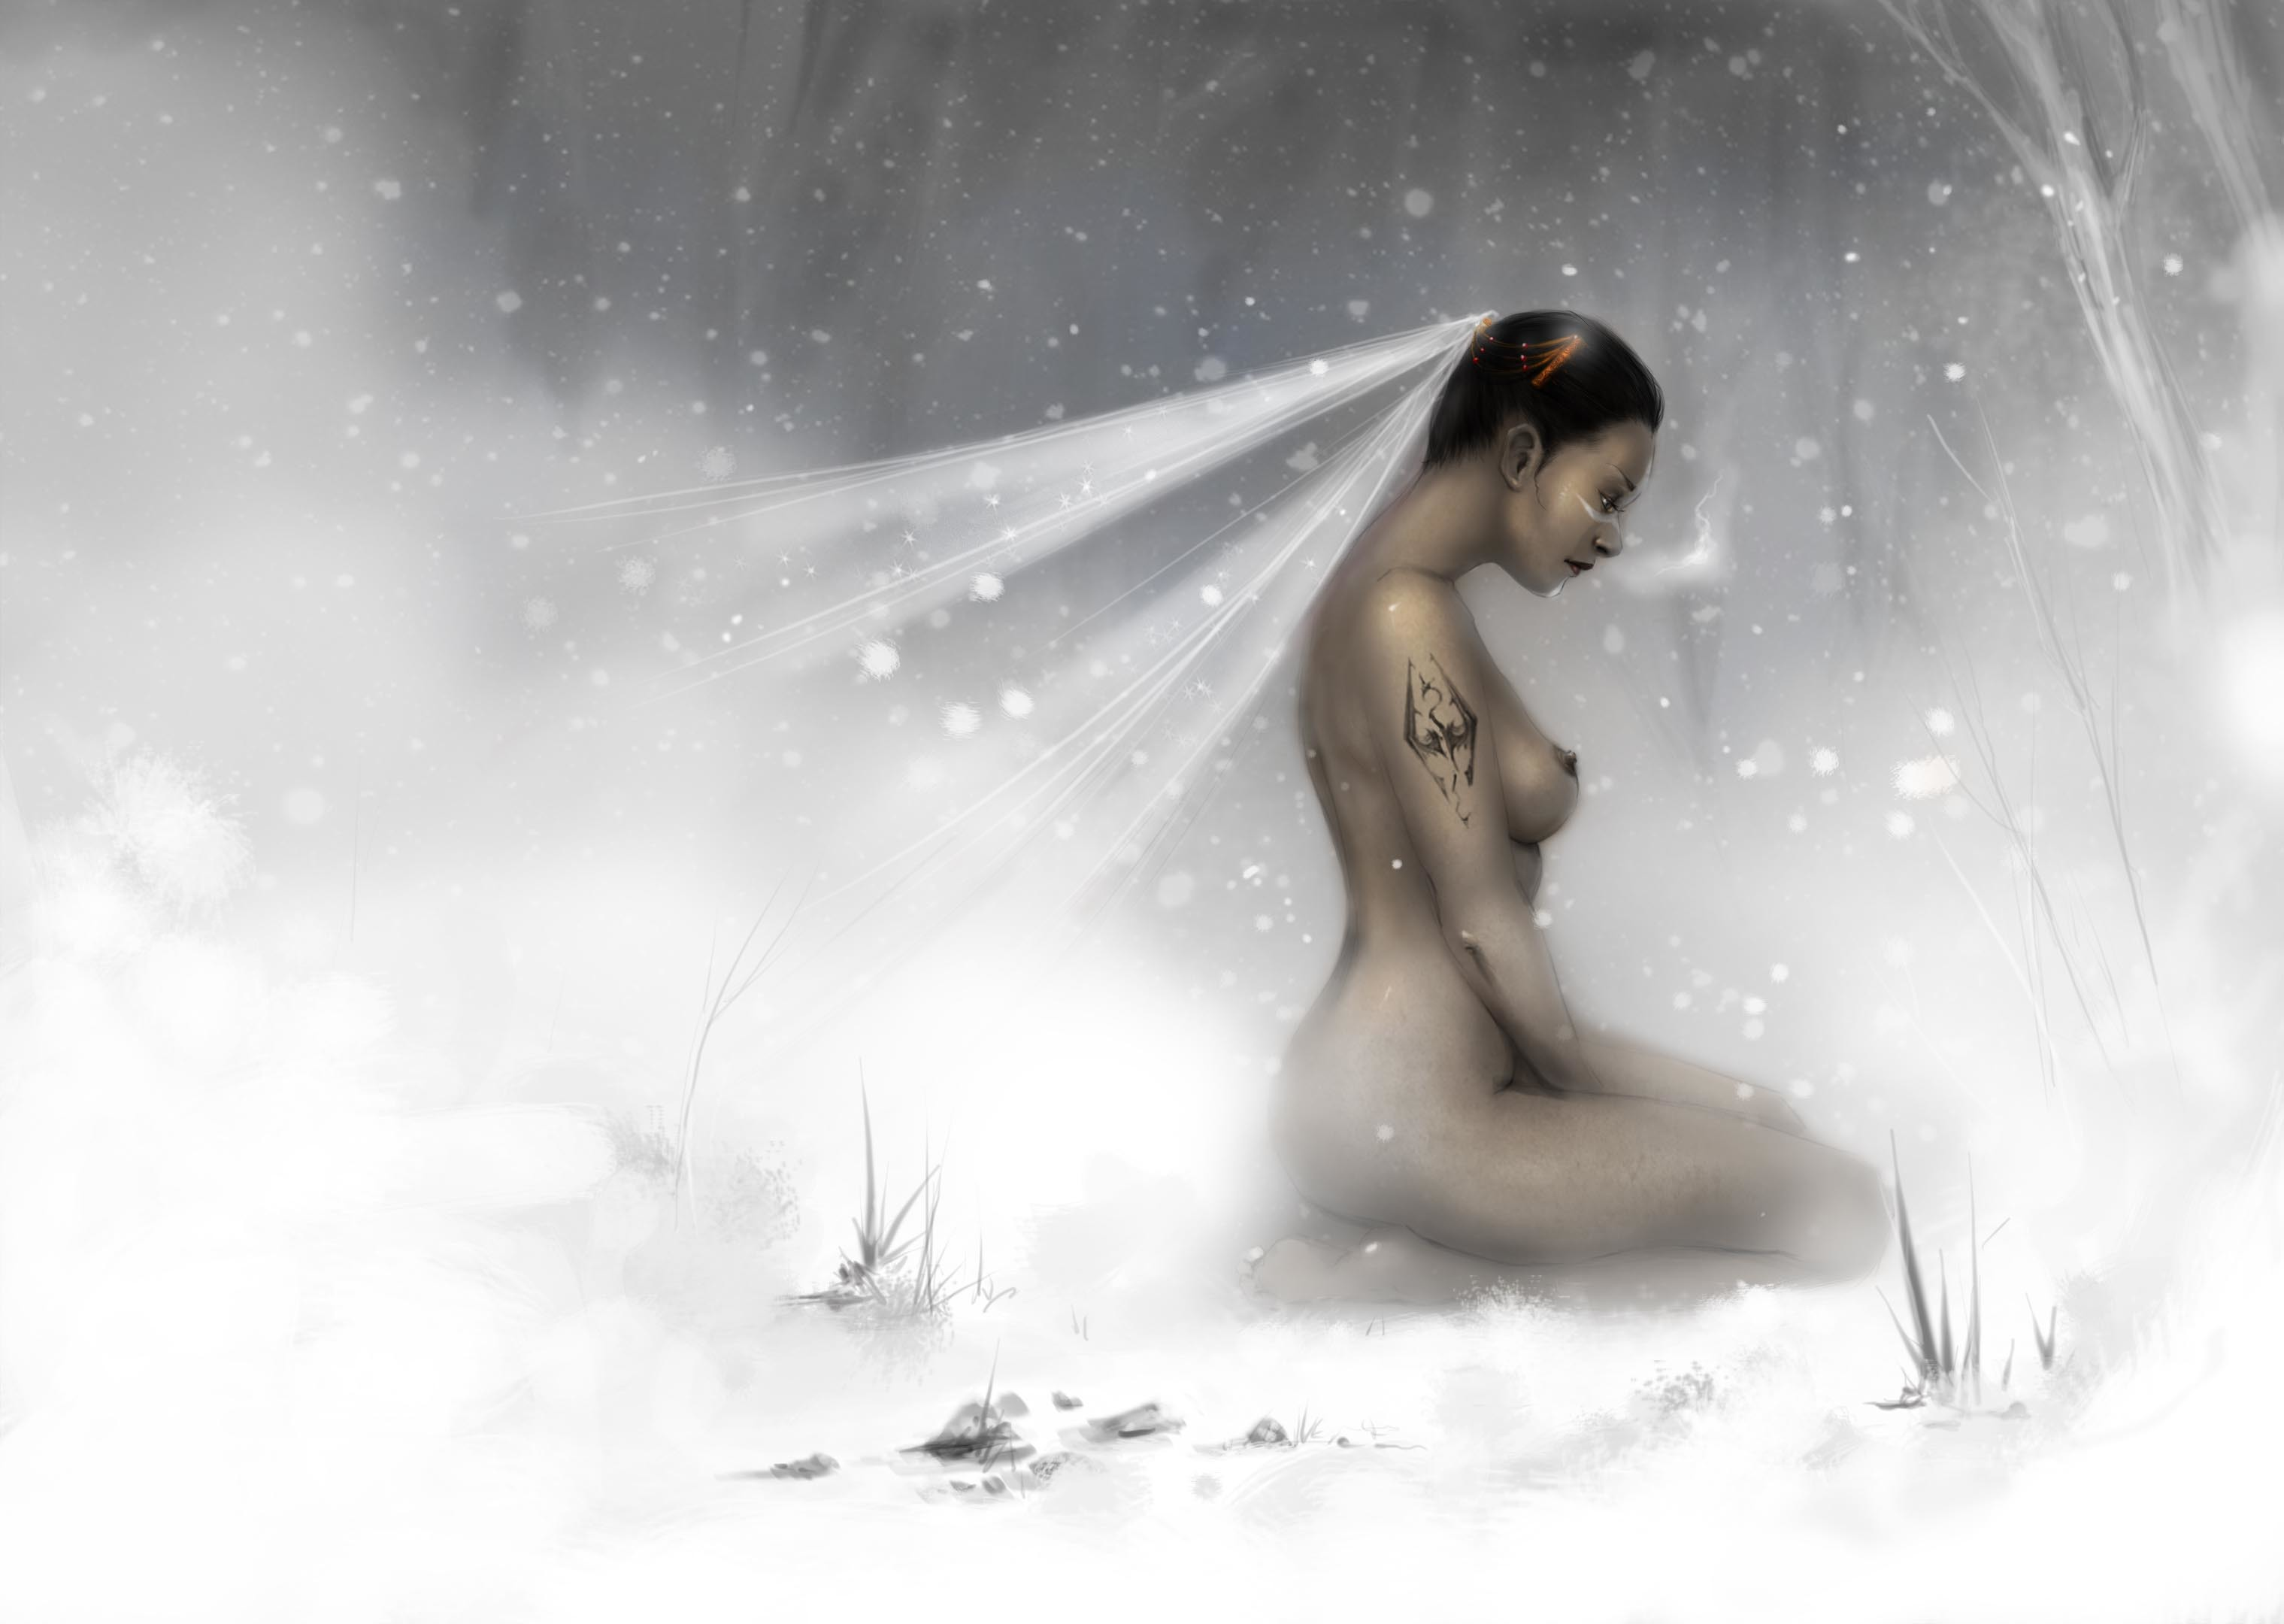 Naked fantasy warrior